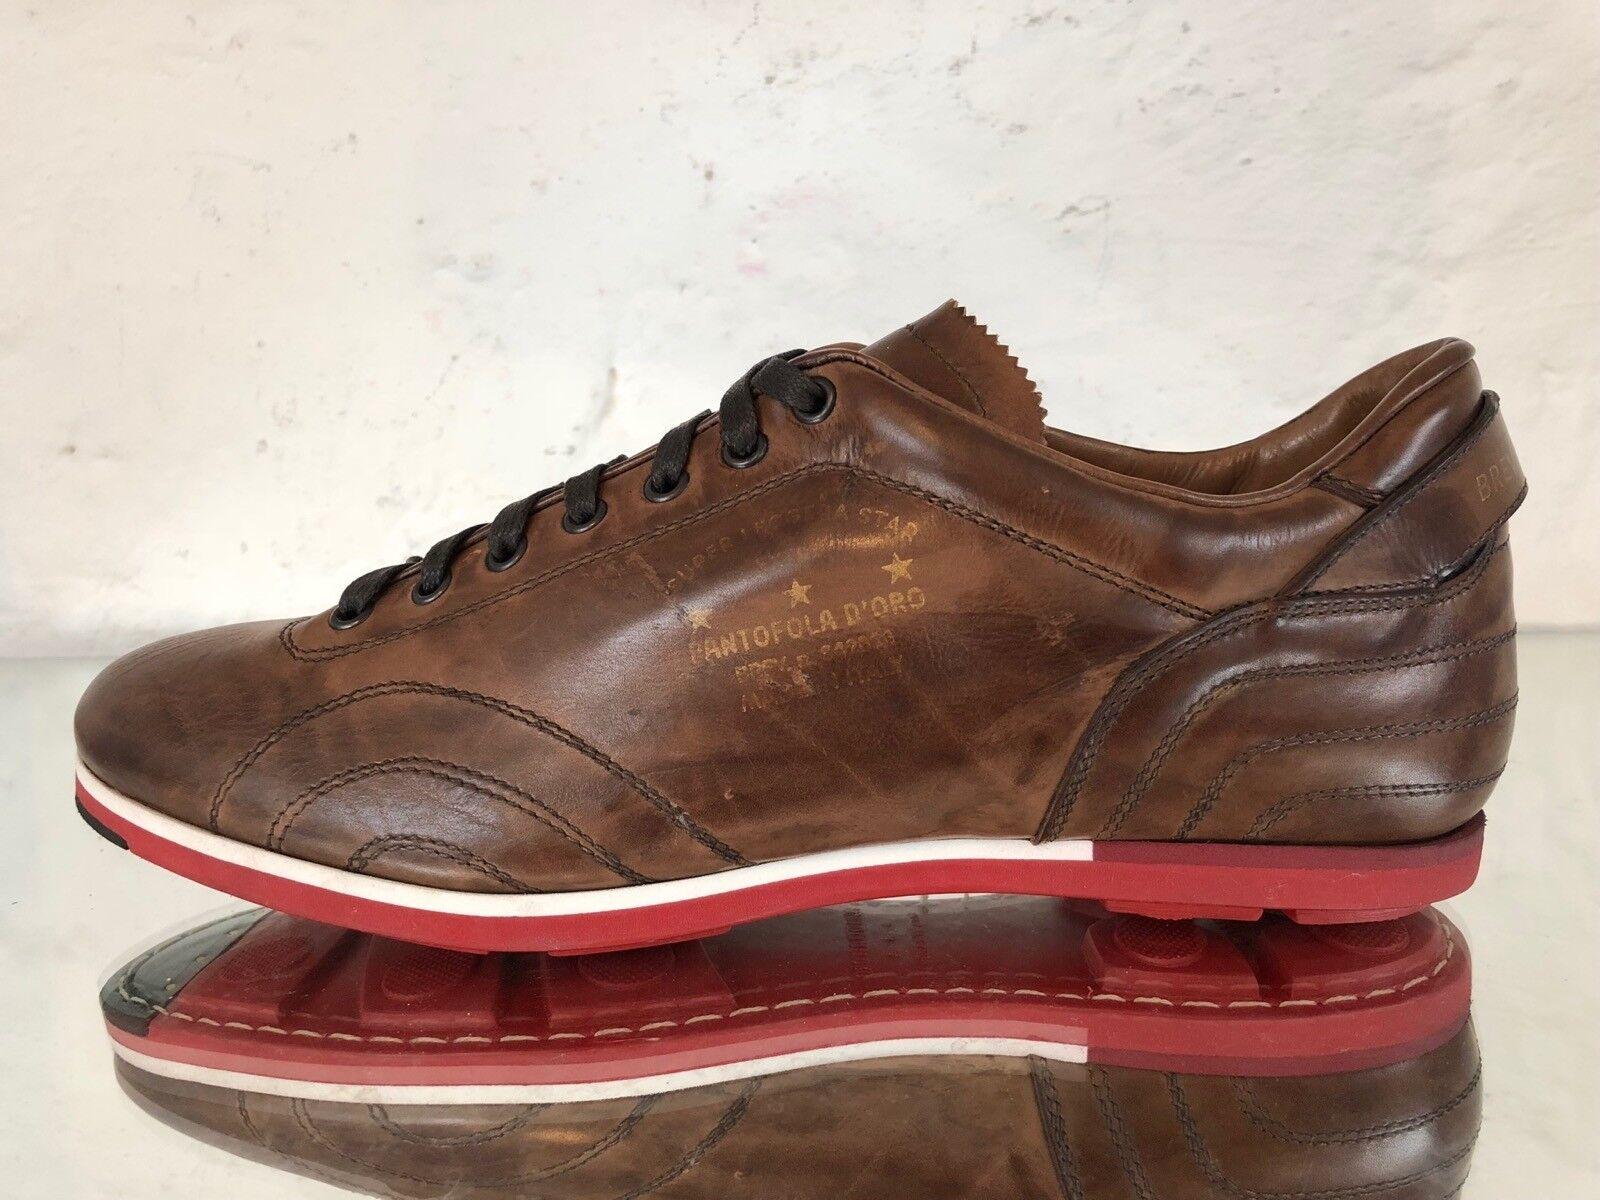 ☆ PANTOFOLA D´ORO PDO Sneaker Harold SSL2CU Leder cognac braun Gr.45 ☆